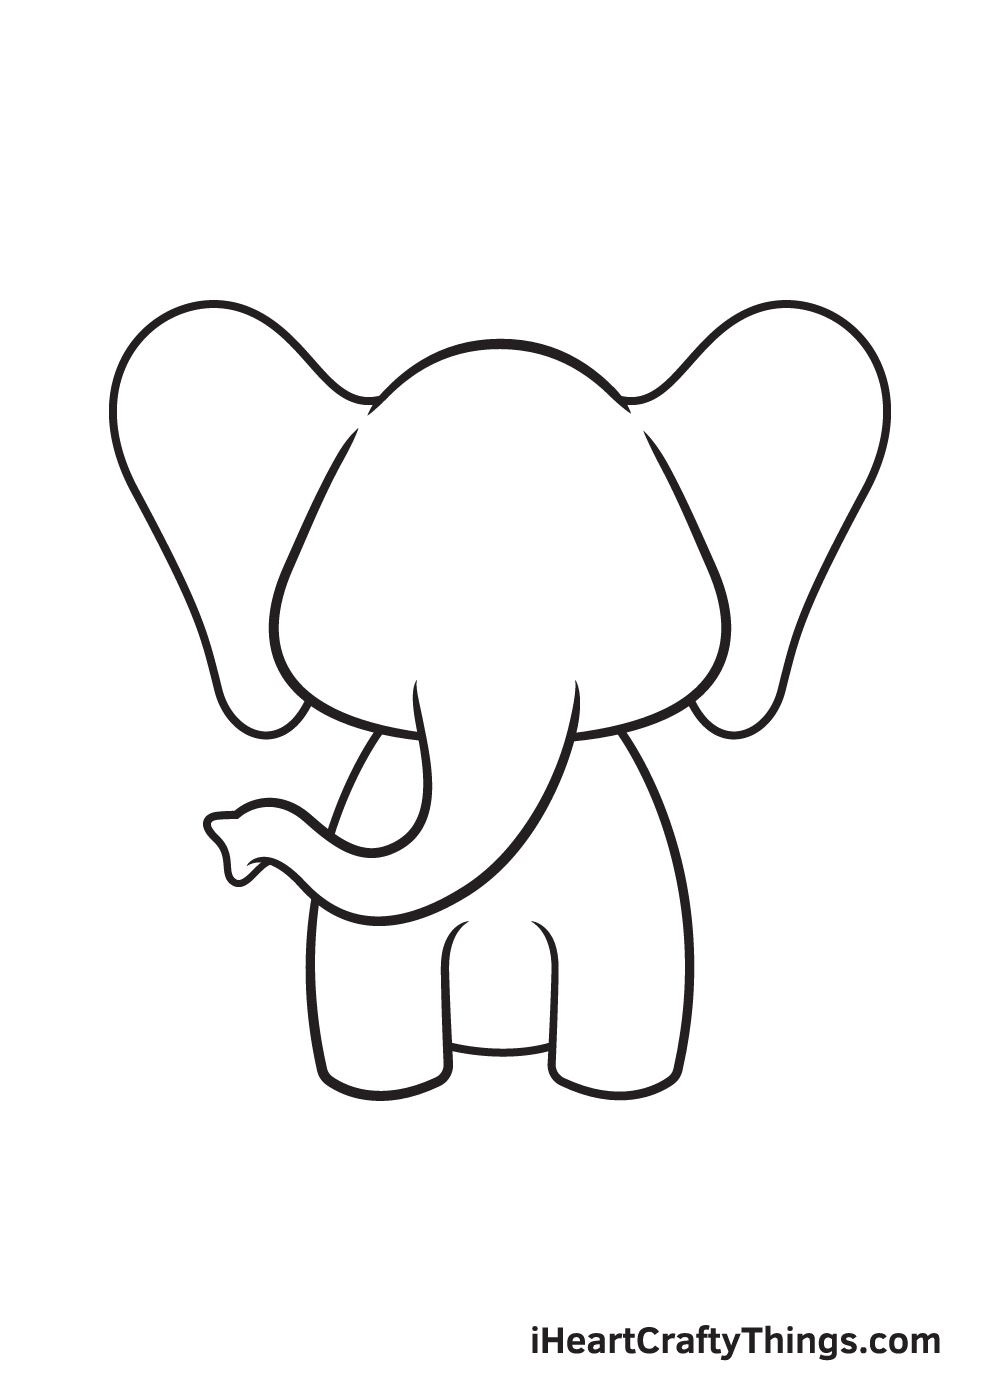 Vẽ con voi - Bước 5